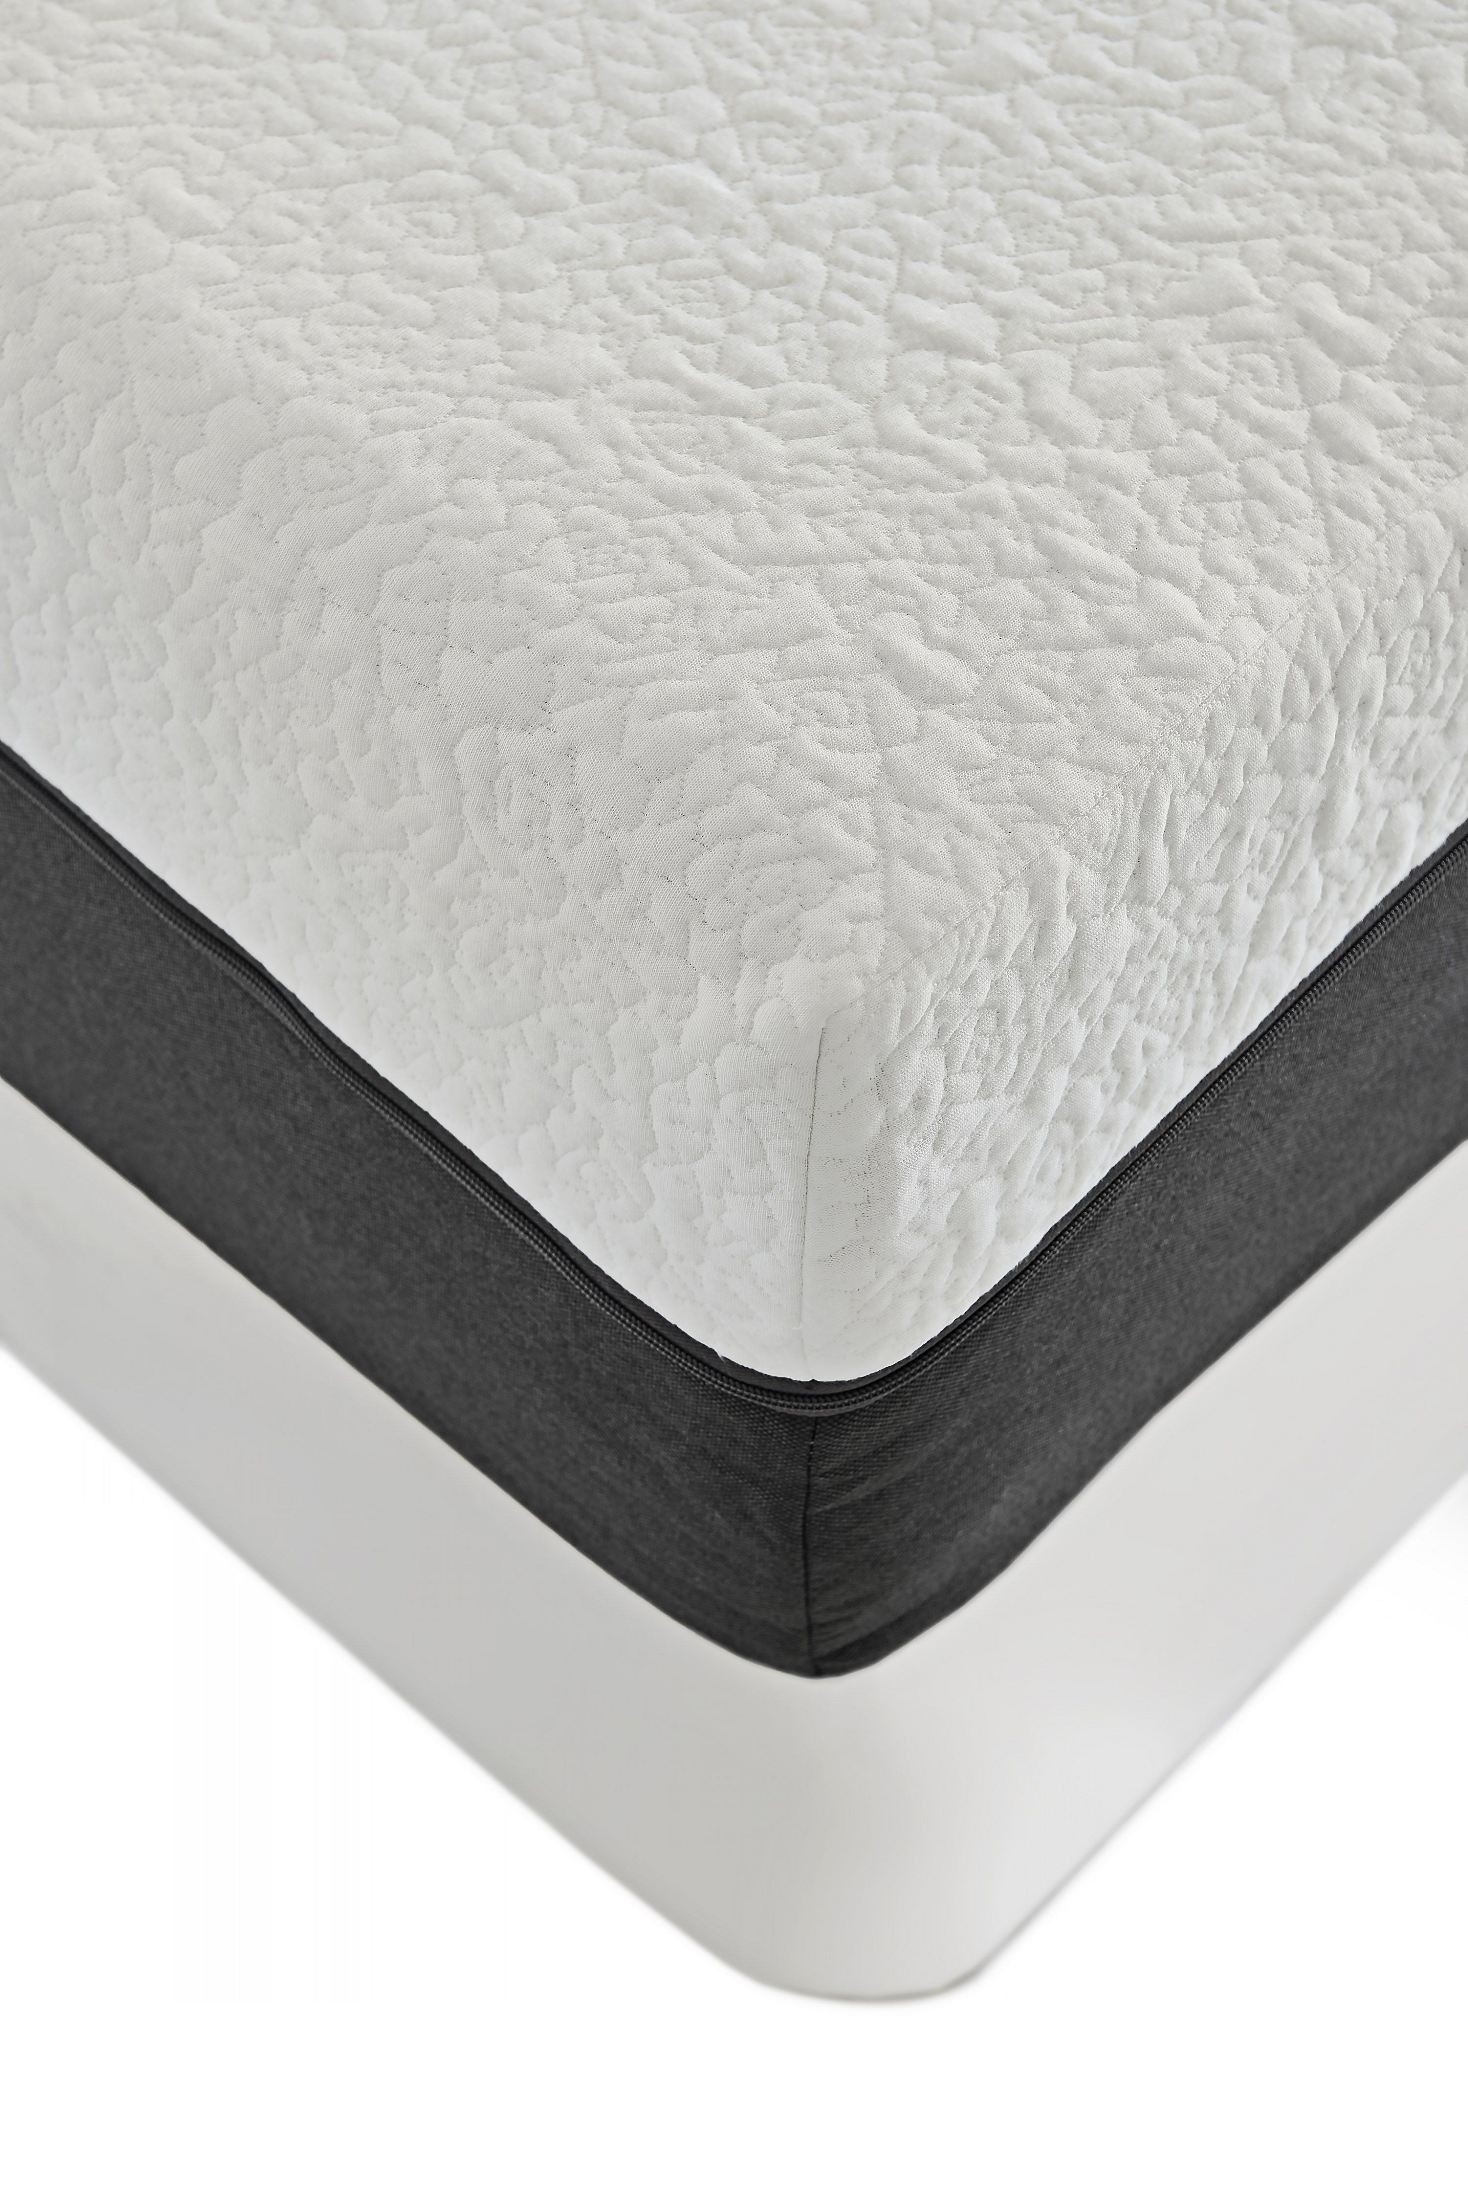 Ashland 12 Memory Foam King Mattress Ashlandk 012013364796 Klaussner